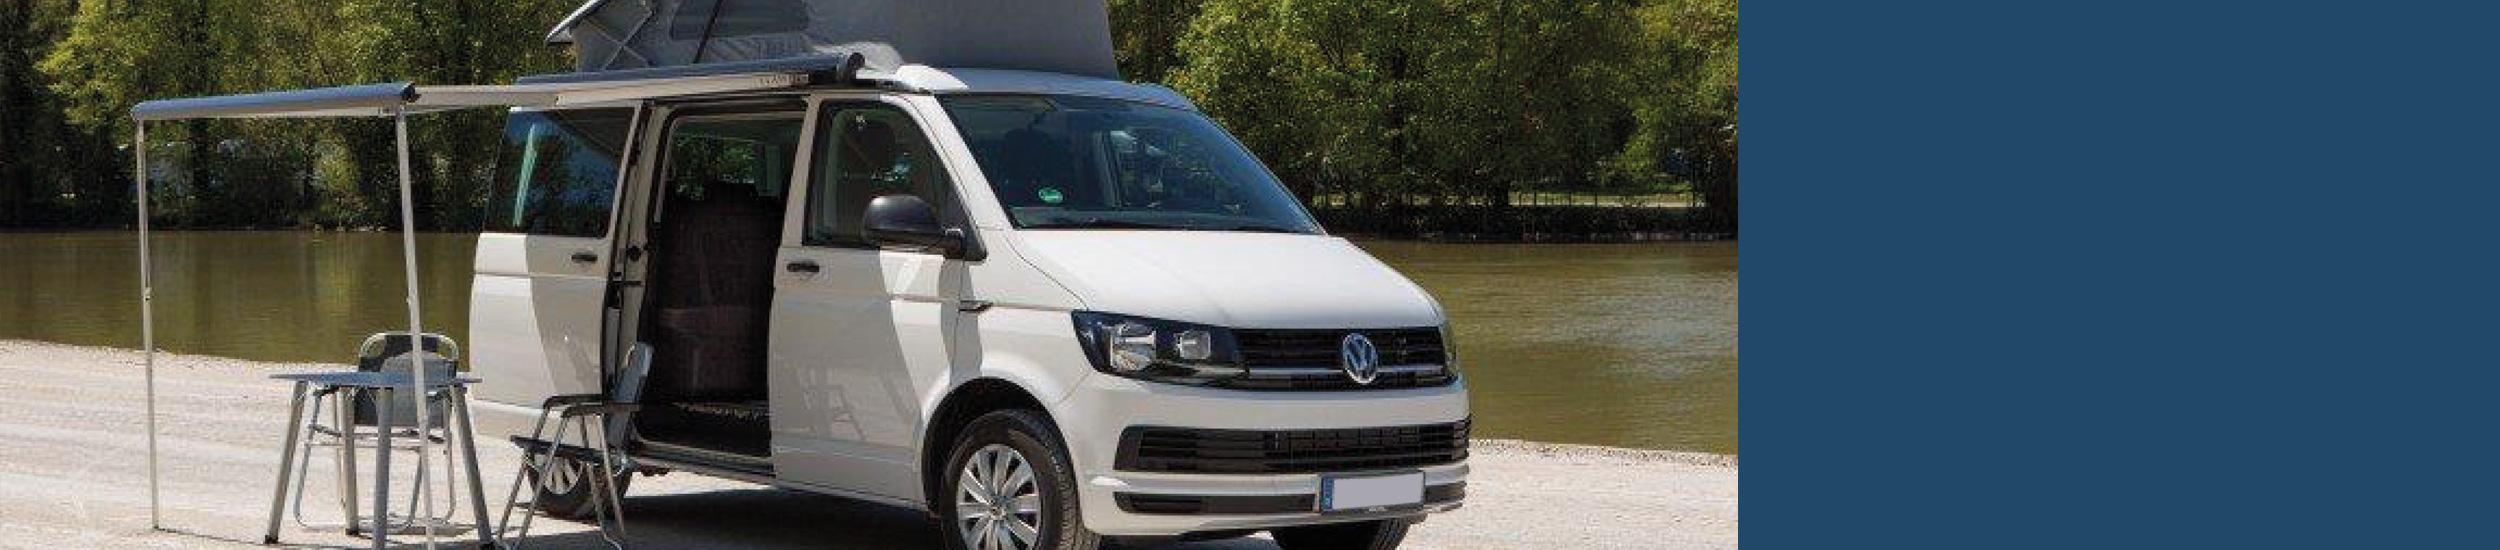 Sparmobile-VW-T6-California-2019